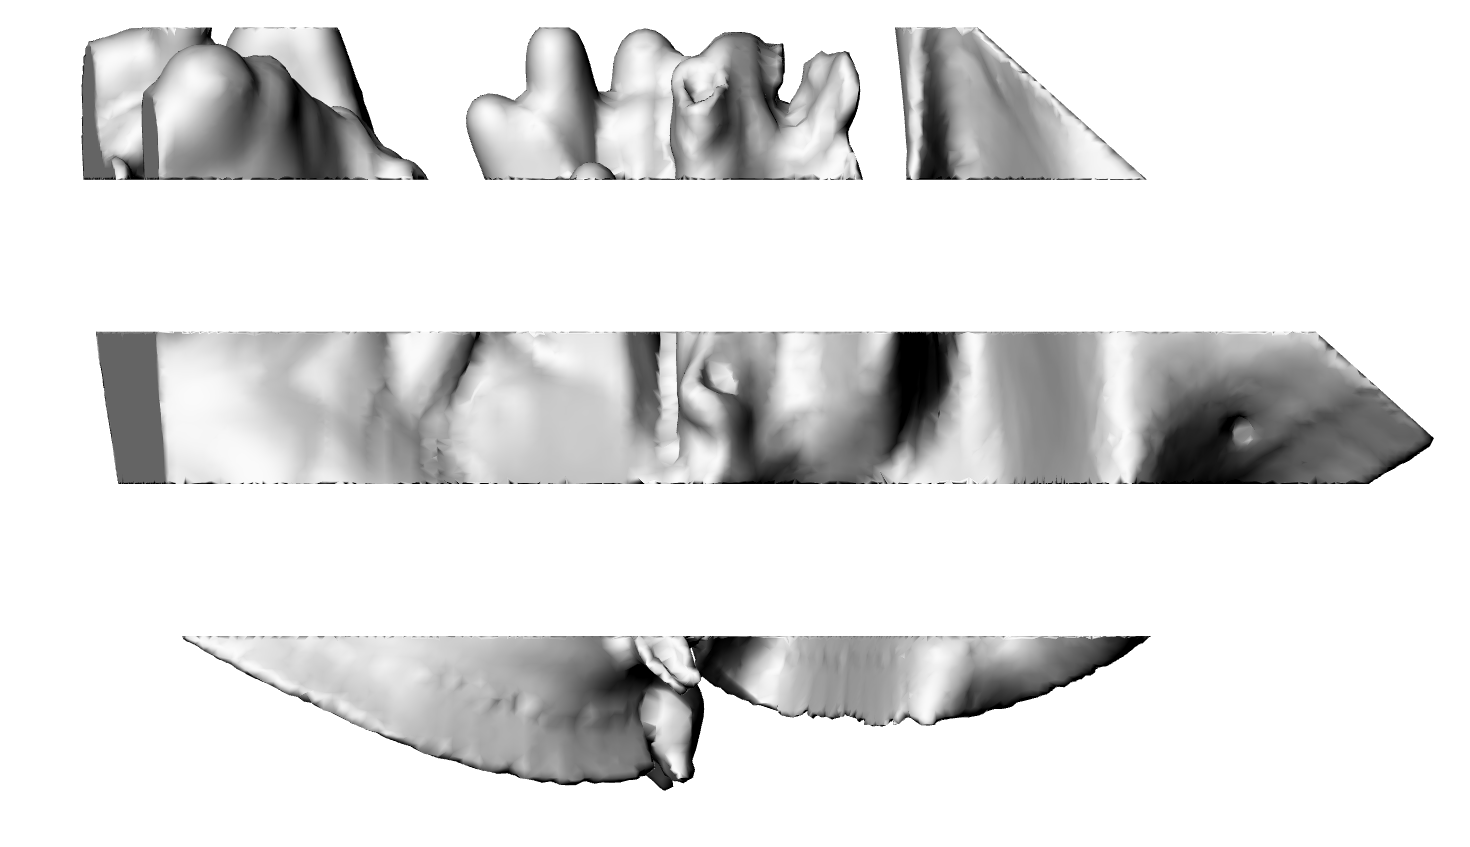 reference slice 1